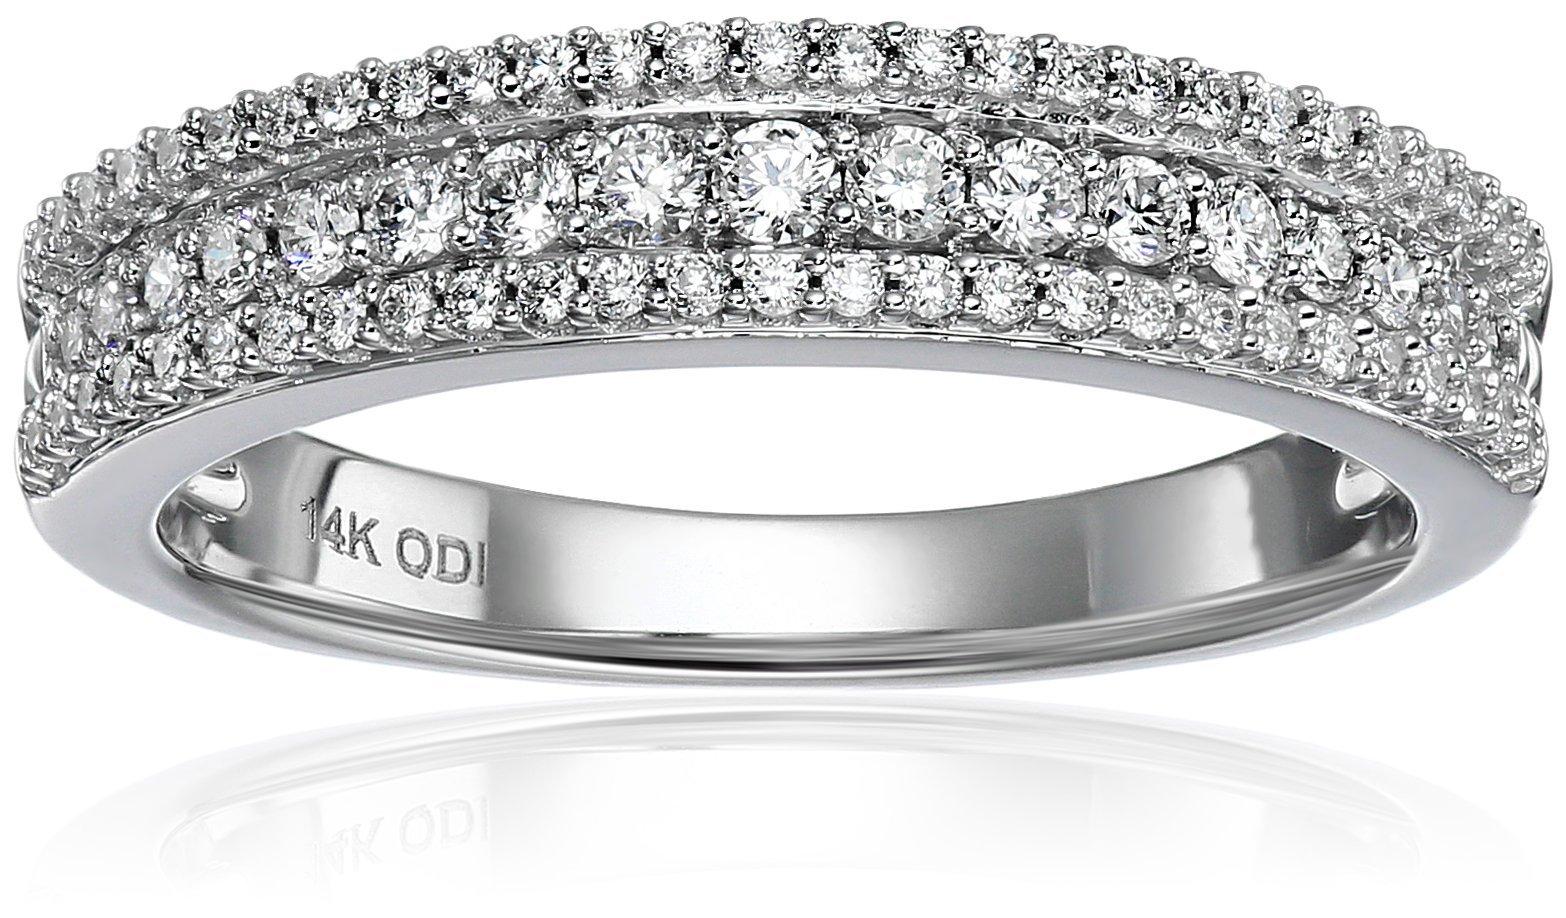 14k White Gold Diamond 3 Row Raised Edge Anniversary Ring (3/8cttw, H-I Color, I1-I2 Clarity), Size 7